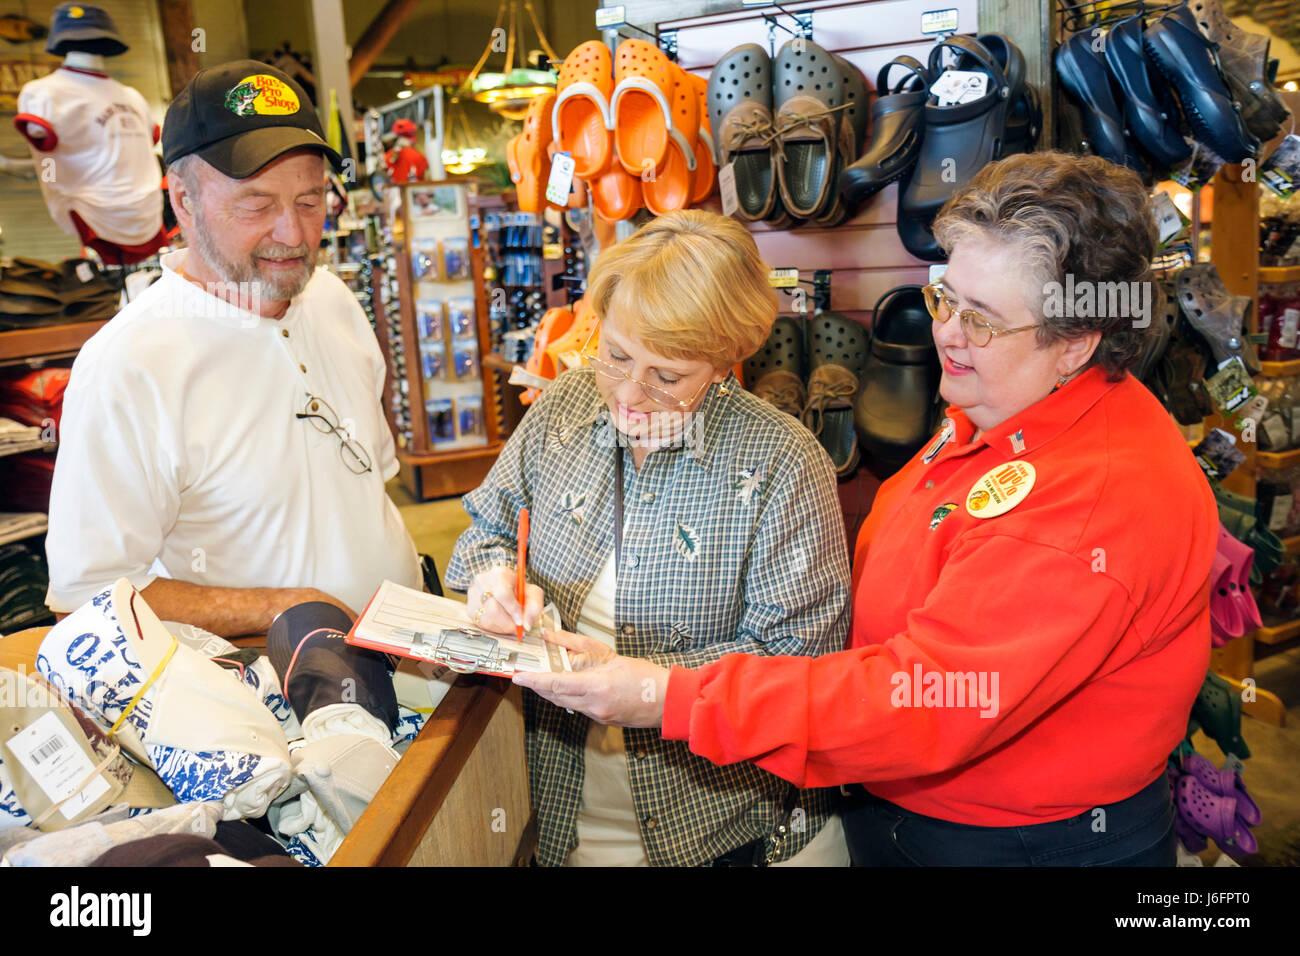 60fd7ac87f Tennessee Sevierville Kodak Bass Pro Shops credit application form man  woman women active senior couple shopping store clerk mer